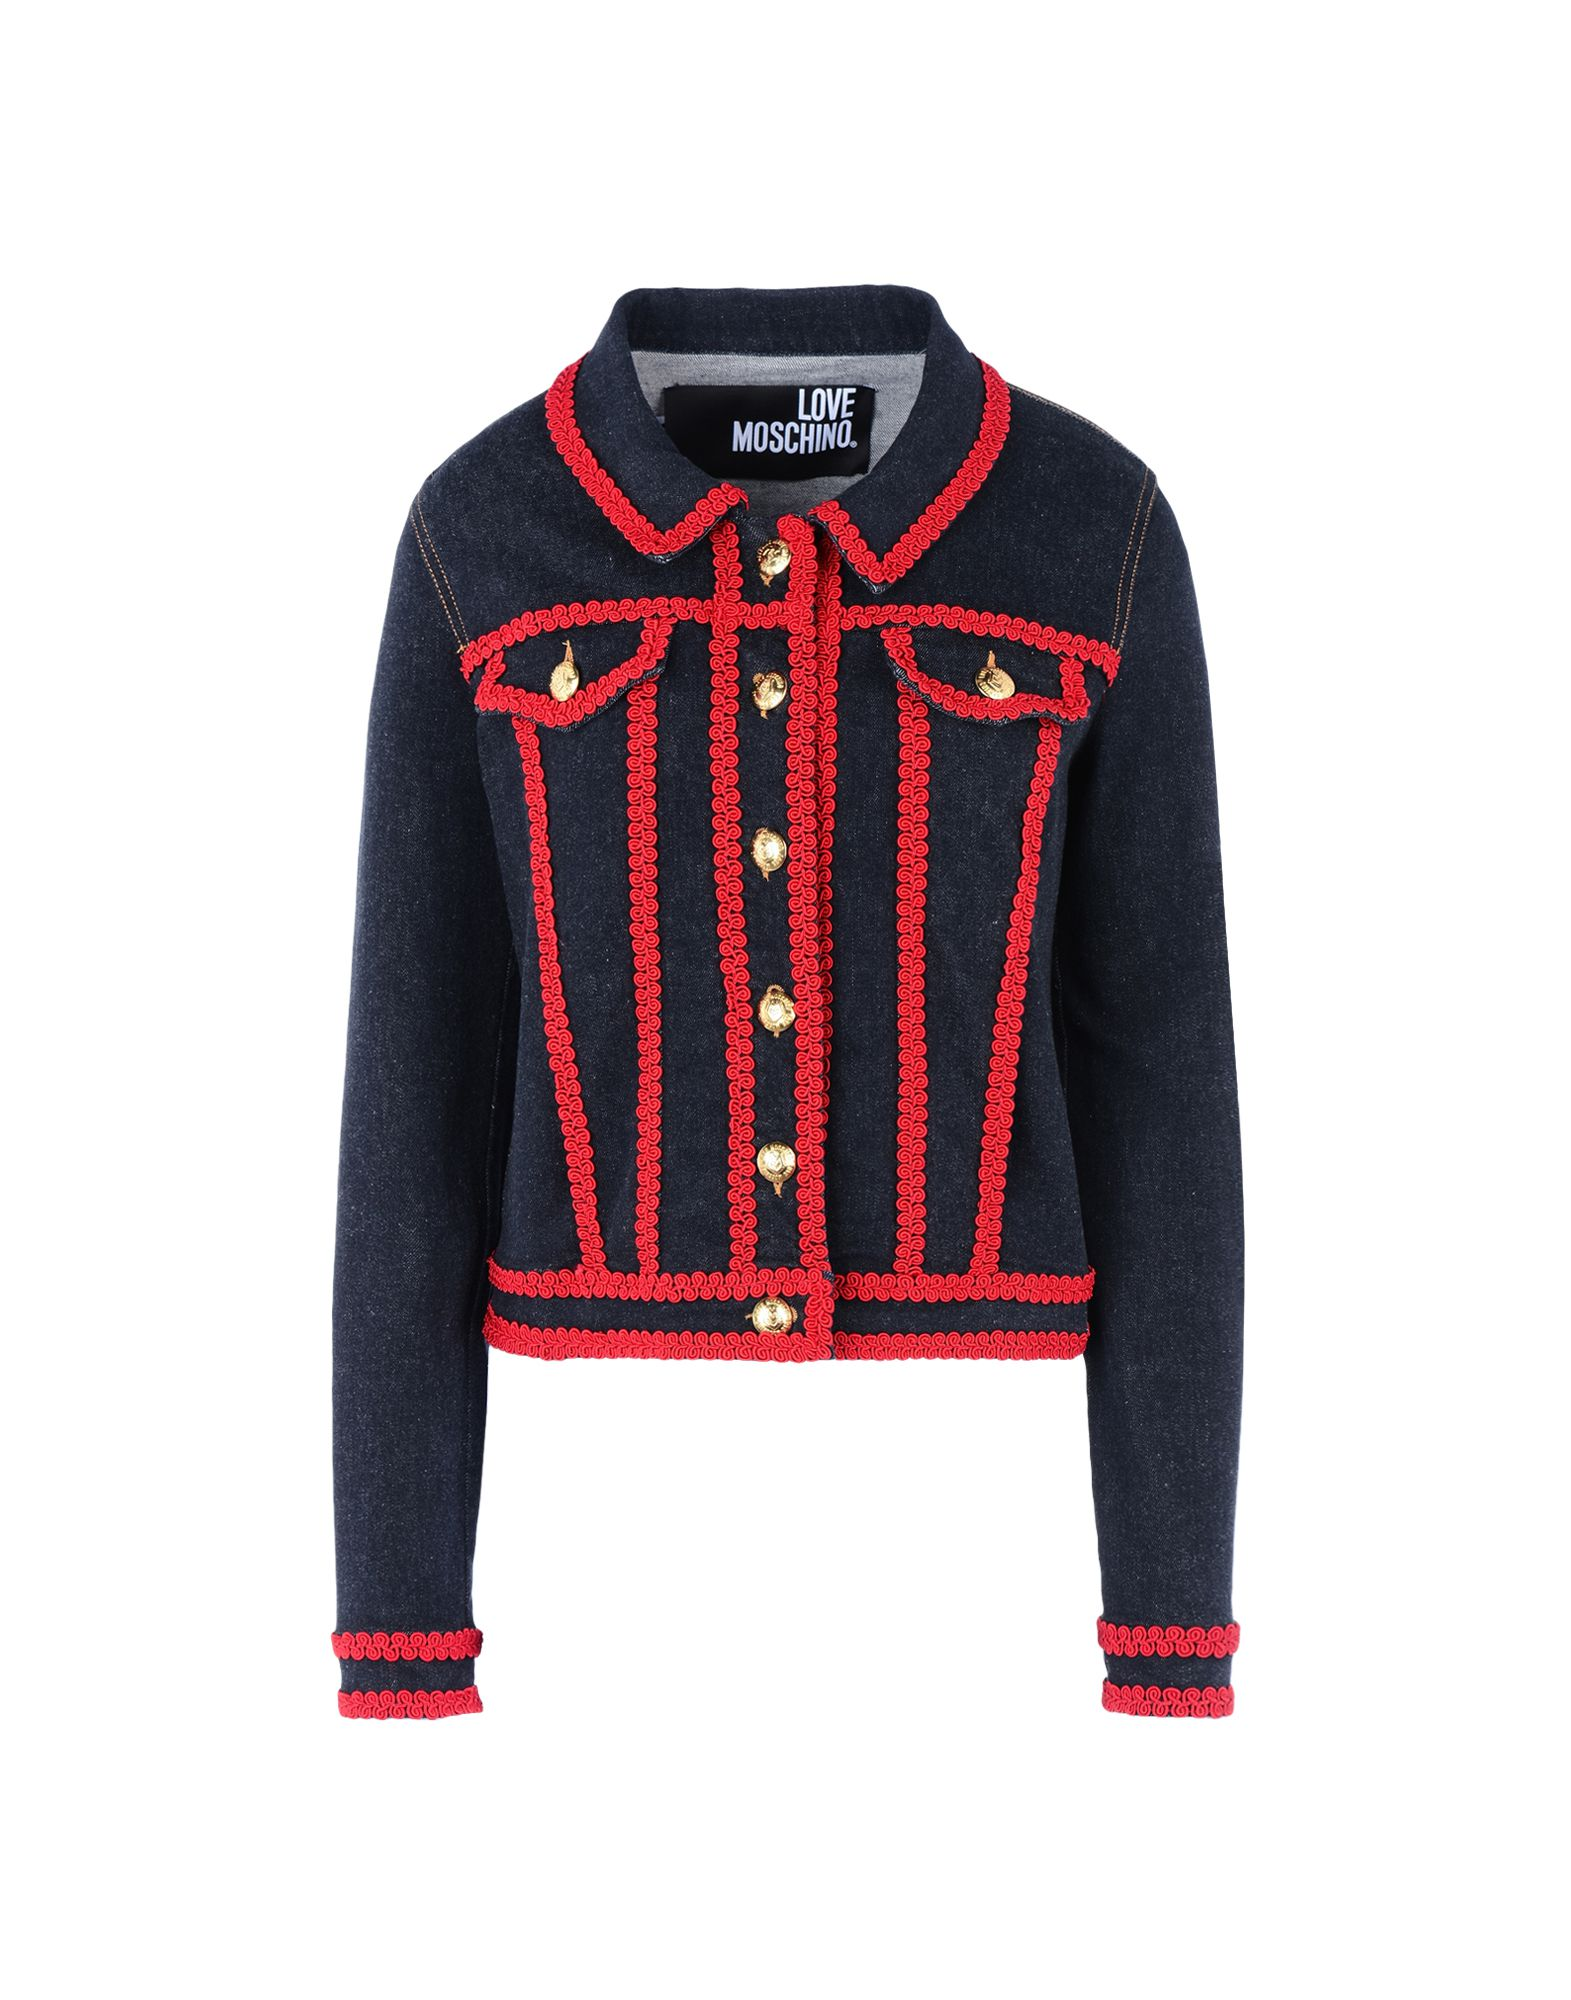 LOVE MOSCHINO Джинсовая верхняя одежда love moschino джинсовая верхняя одежда